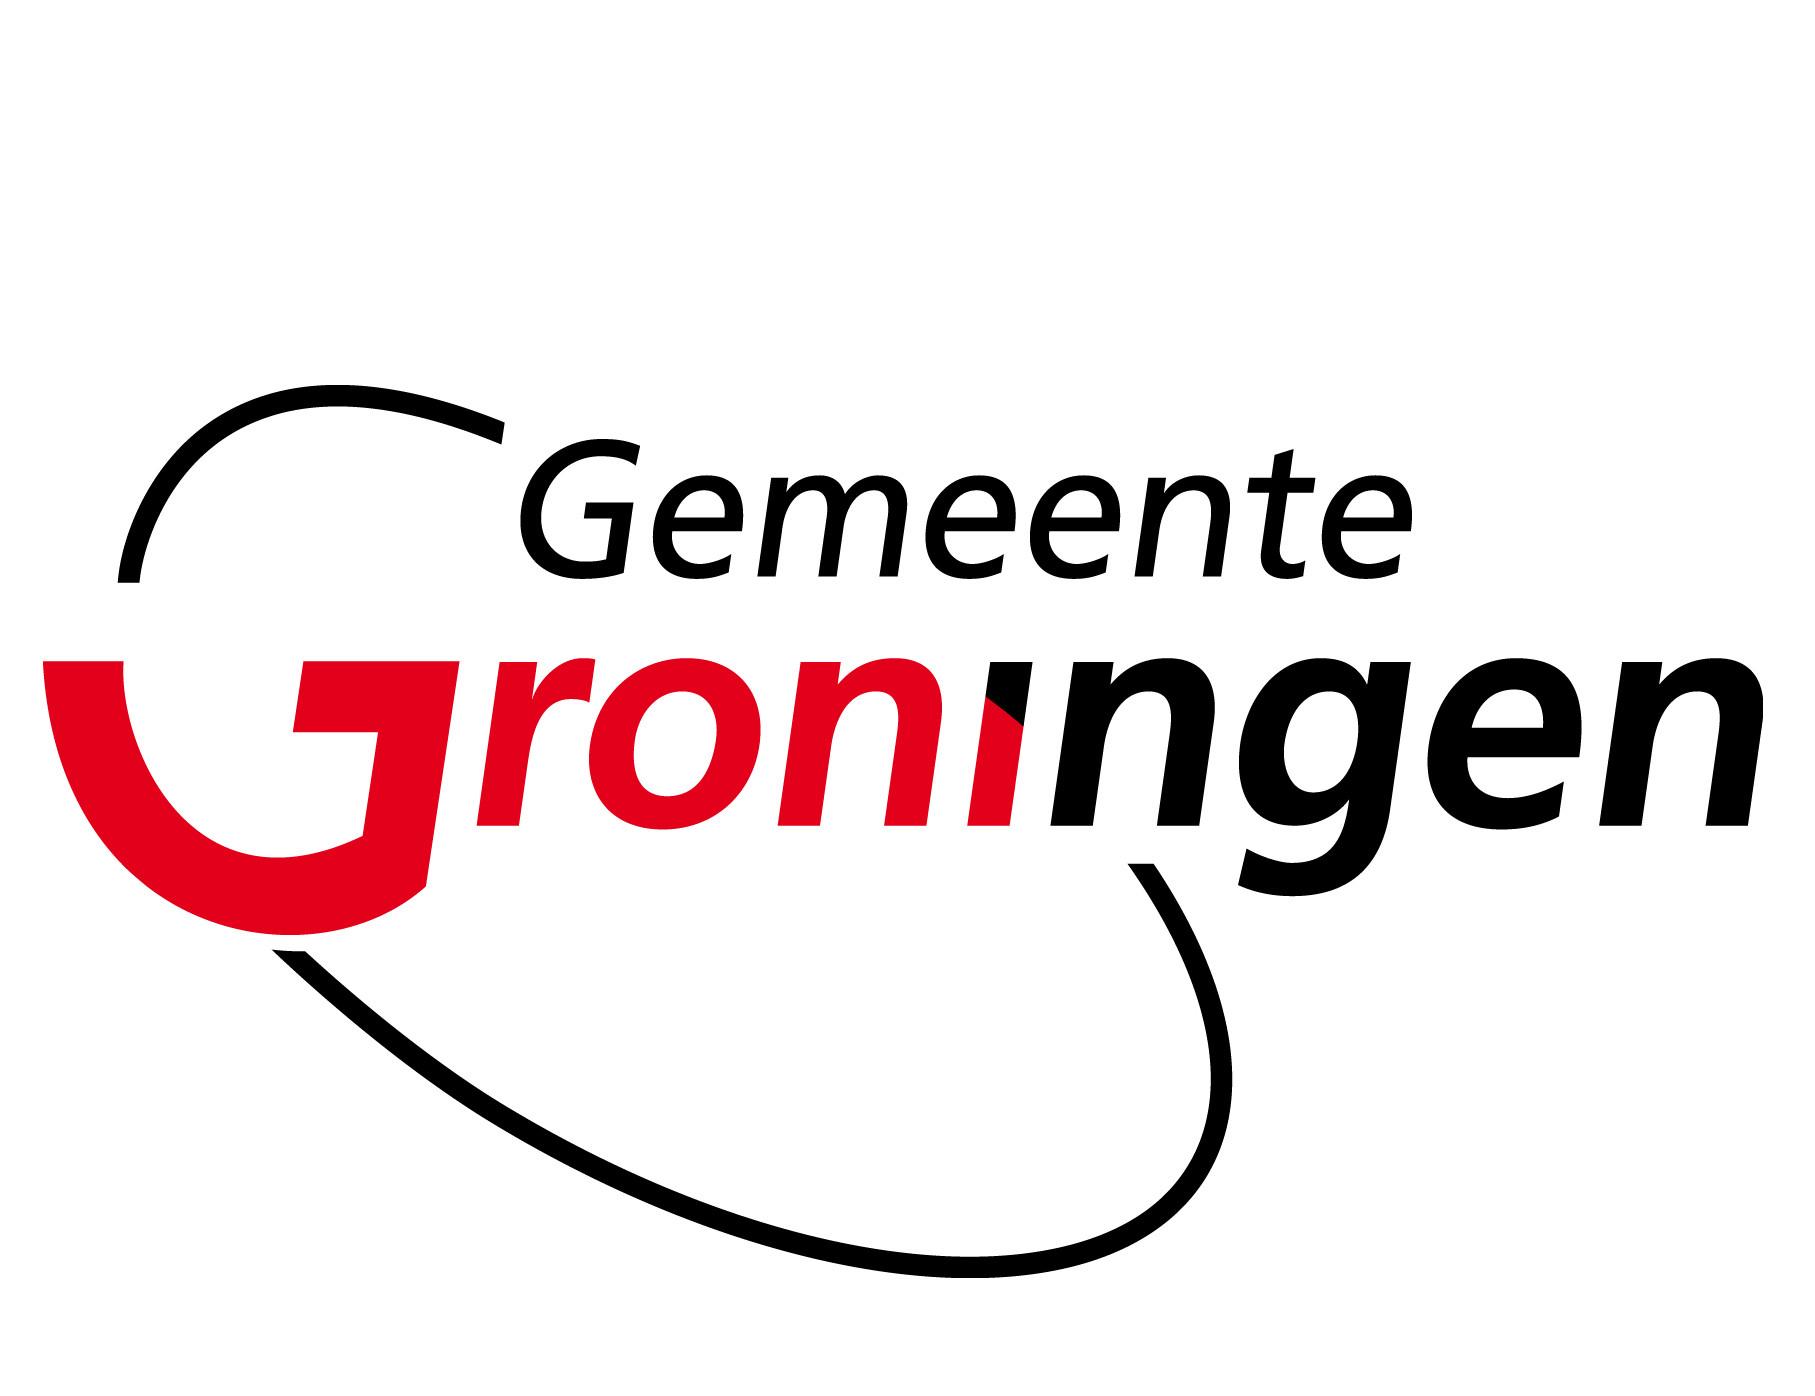 Groningen Township- The Netherlands